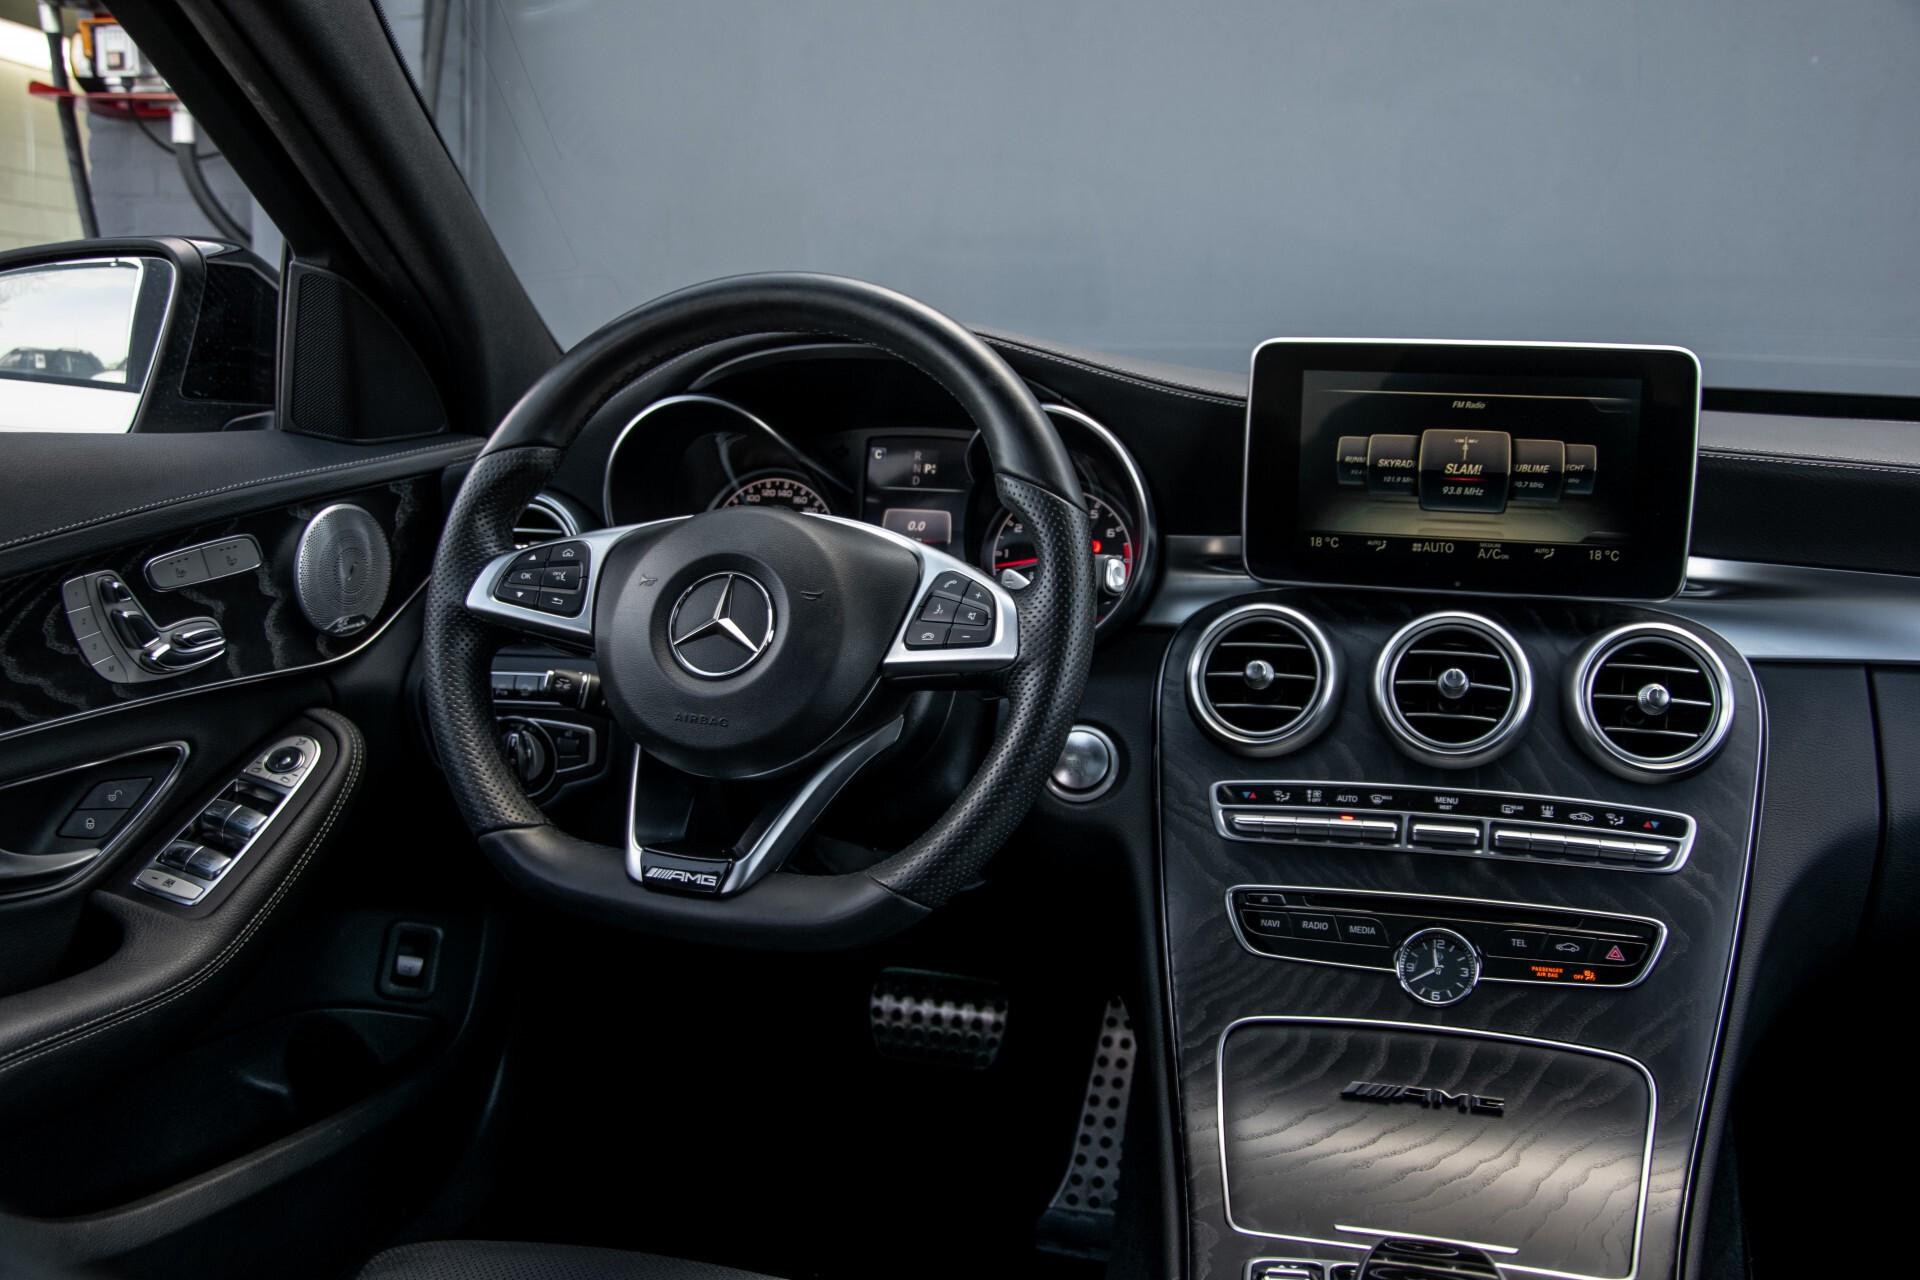 Mercedes-Benz C-Klasse 450/43 AMG 4-M Distronic/Standkachel/Panorama/Keyless/Harman-Kardon/Stoelkoeling Aut7 Foto 6